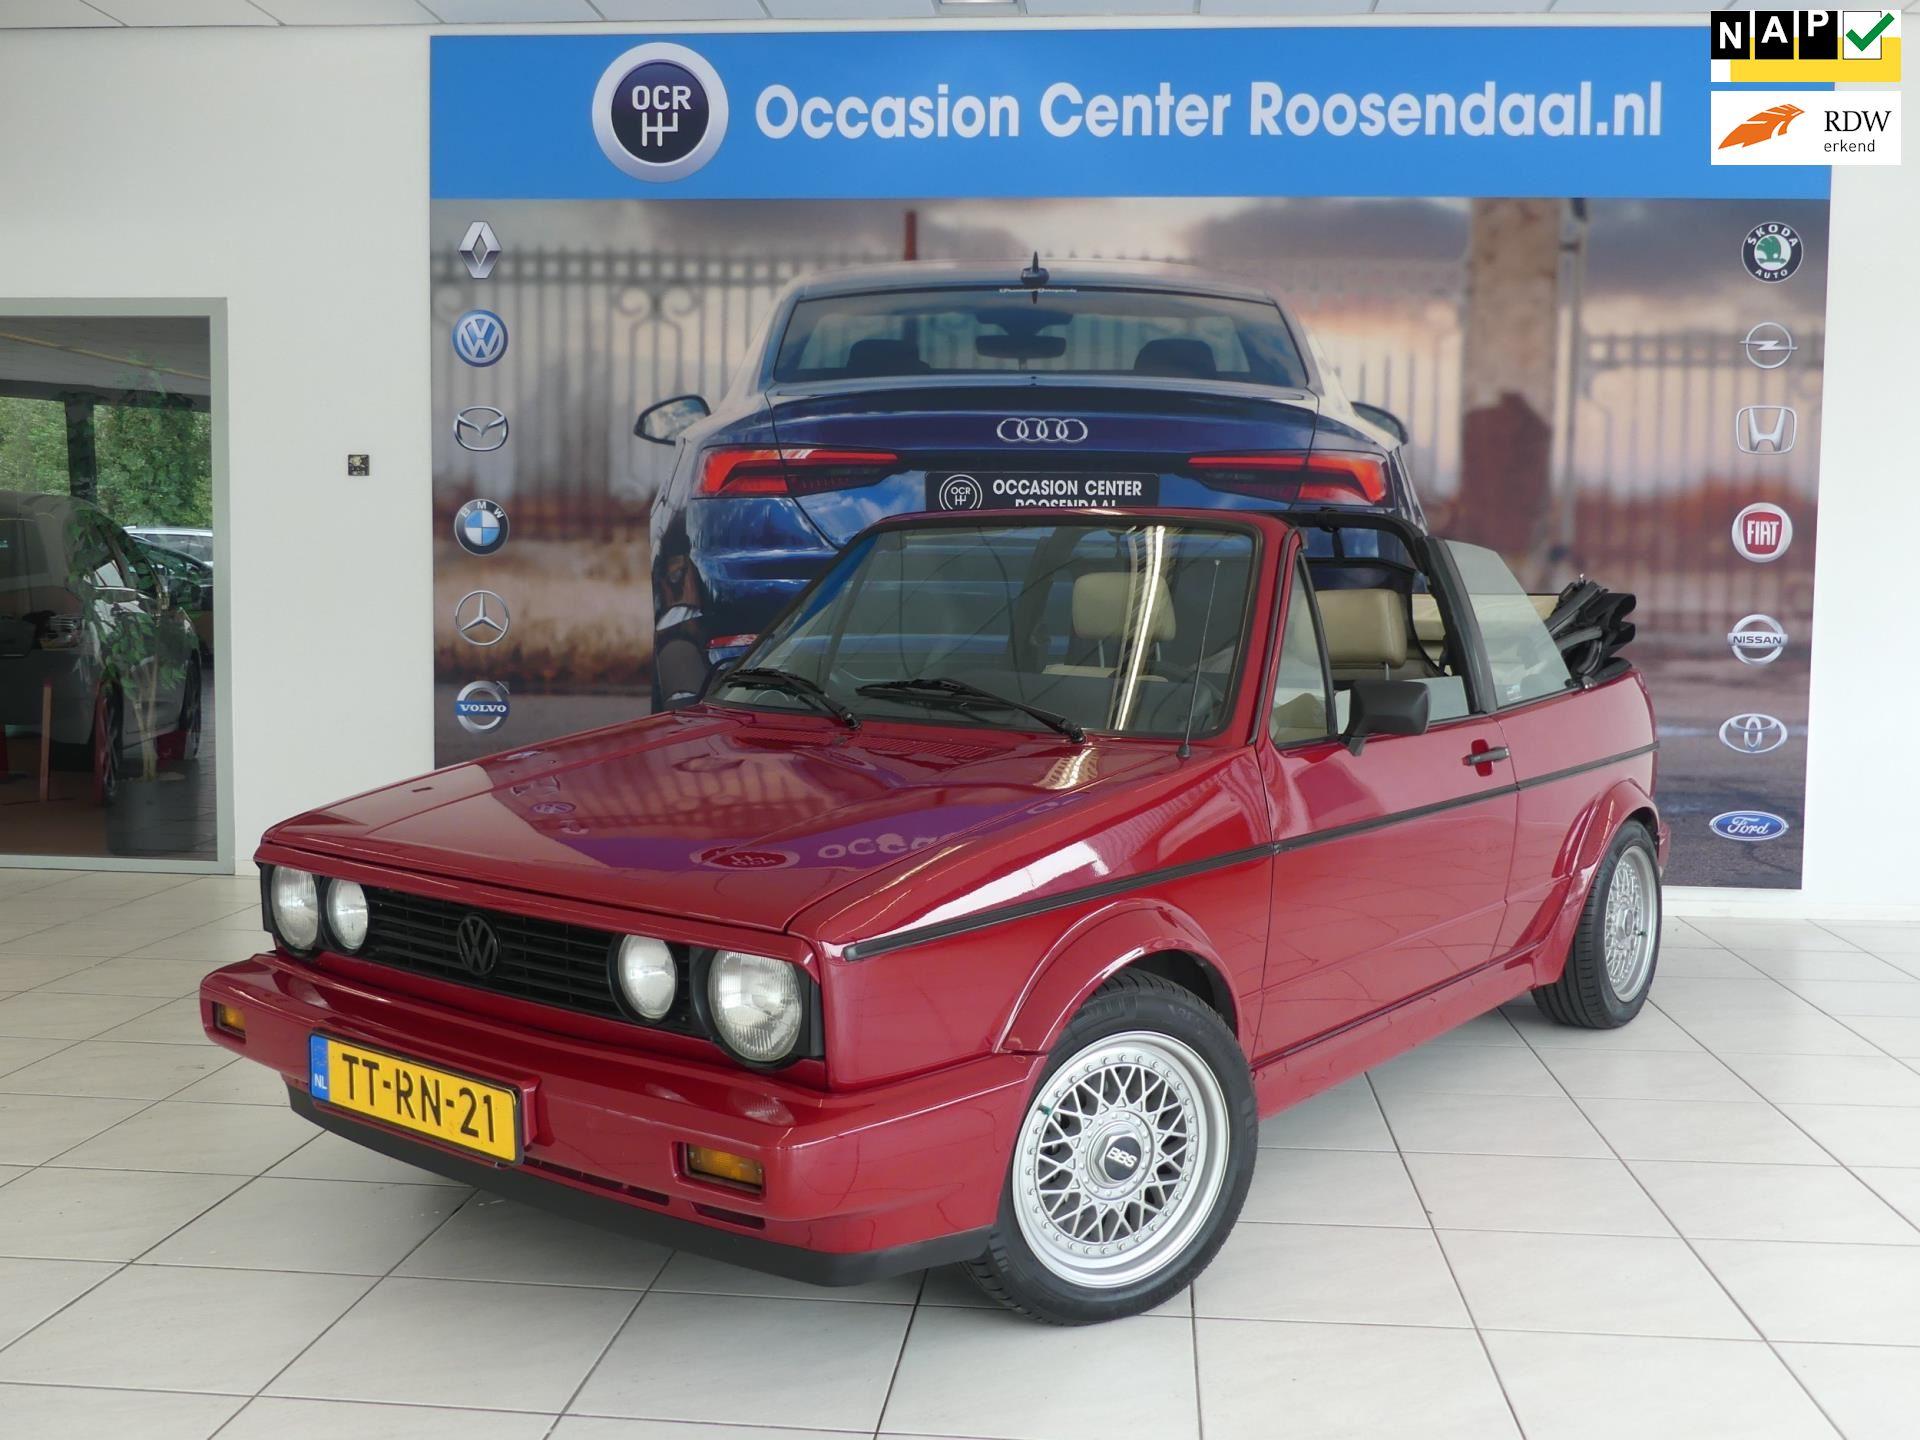 Volkswagen Golf Cabriolet occasion - Occasion Center Roosendaal